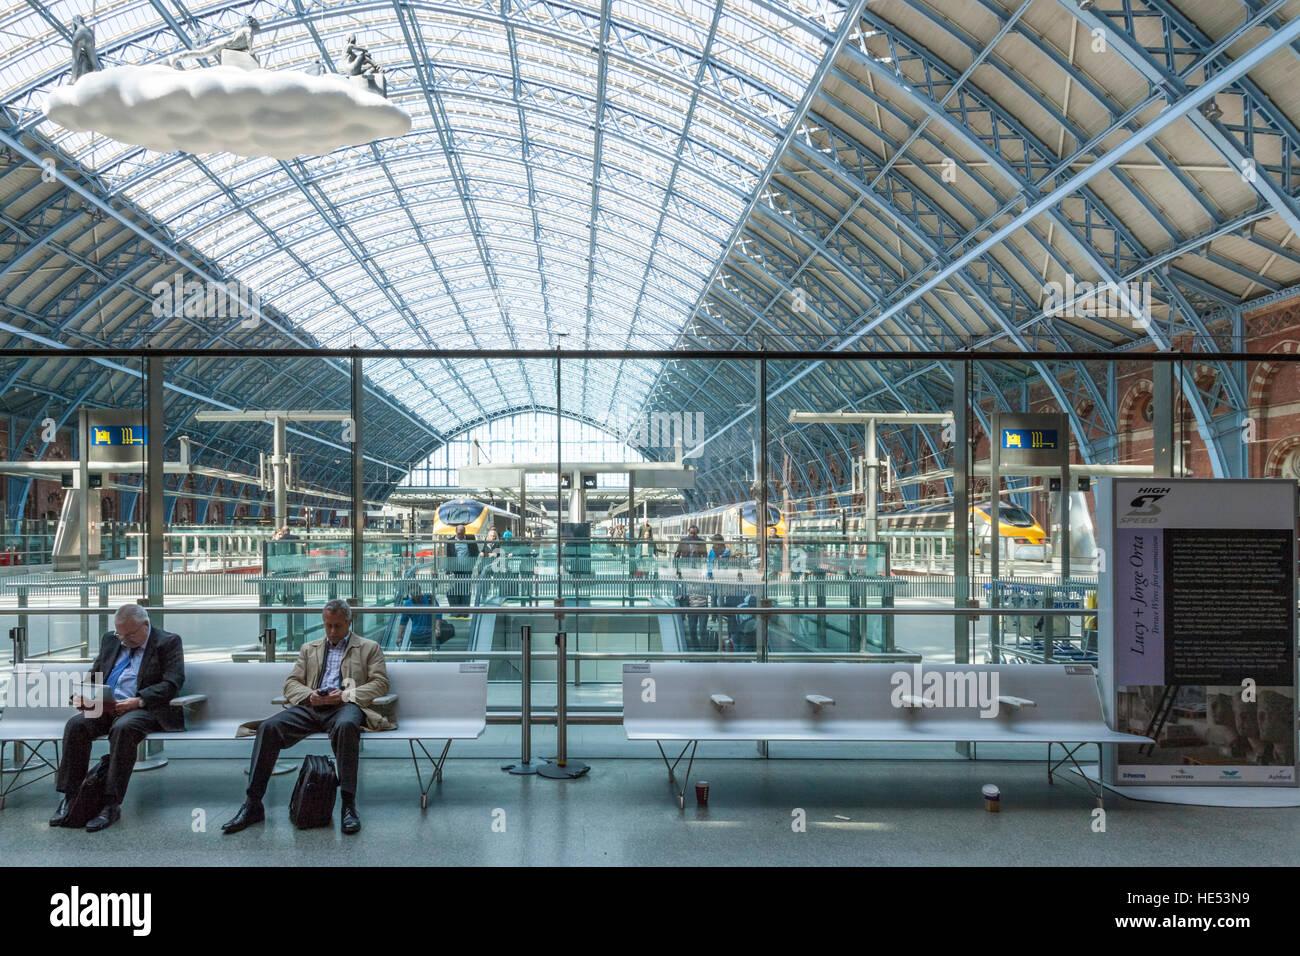 Business travellers at St Pancras International Station, London, UK - Stock Image